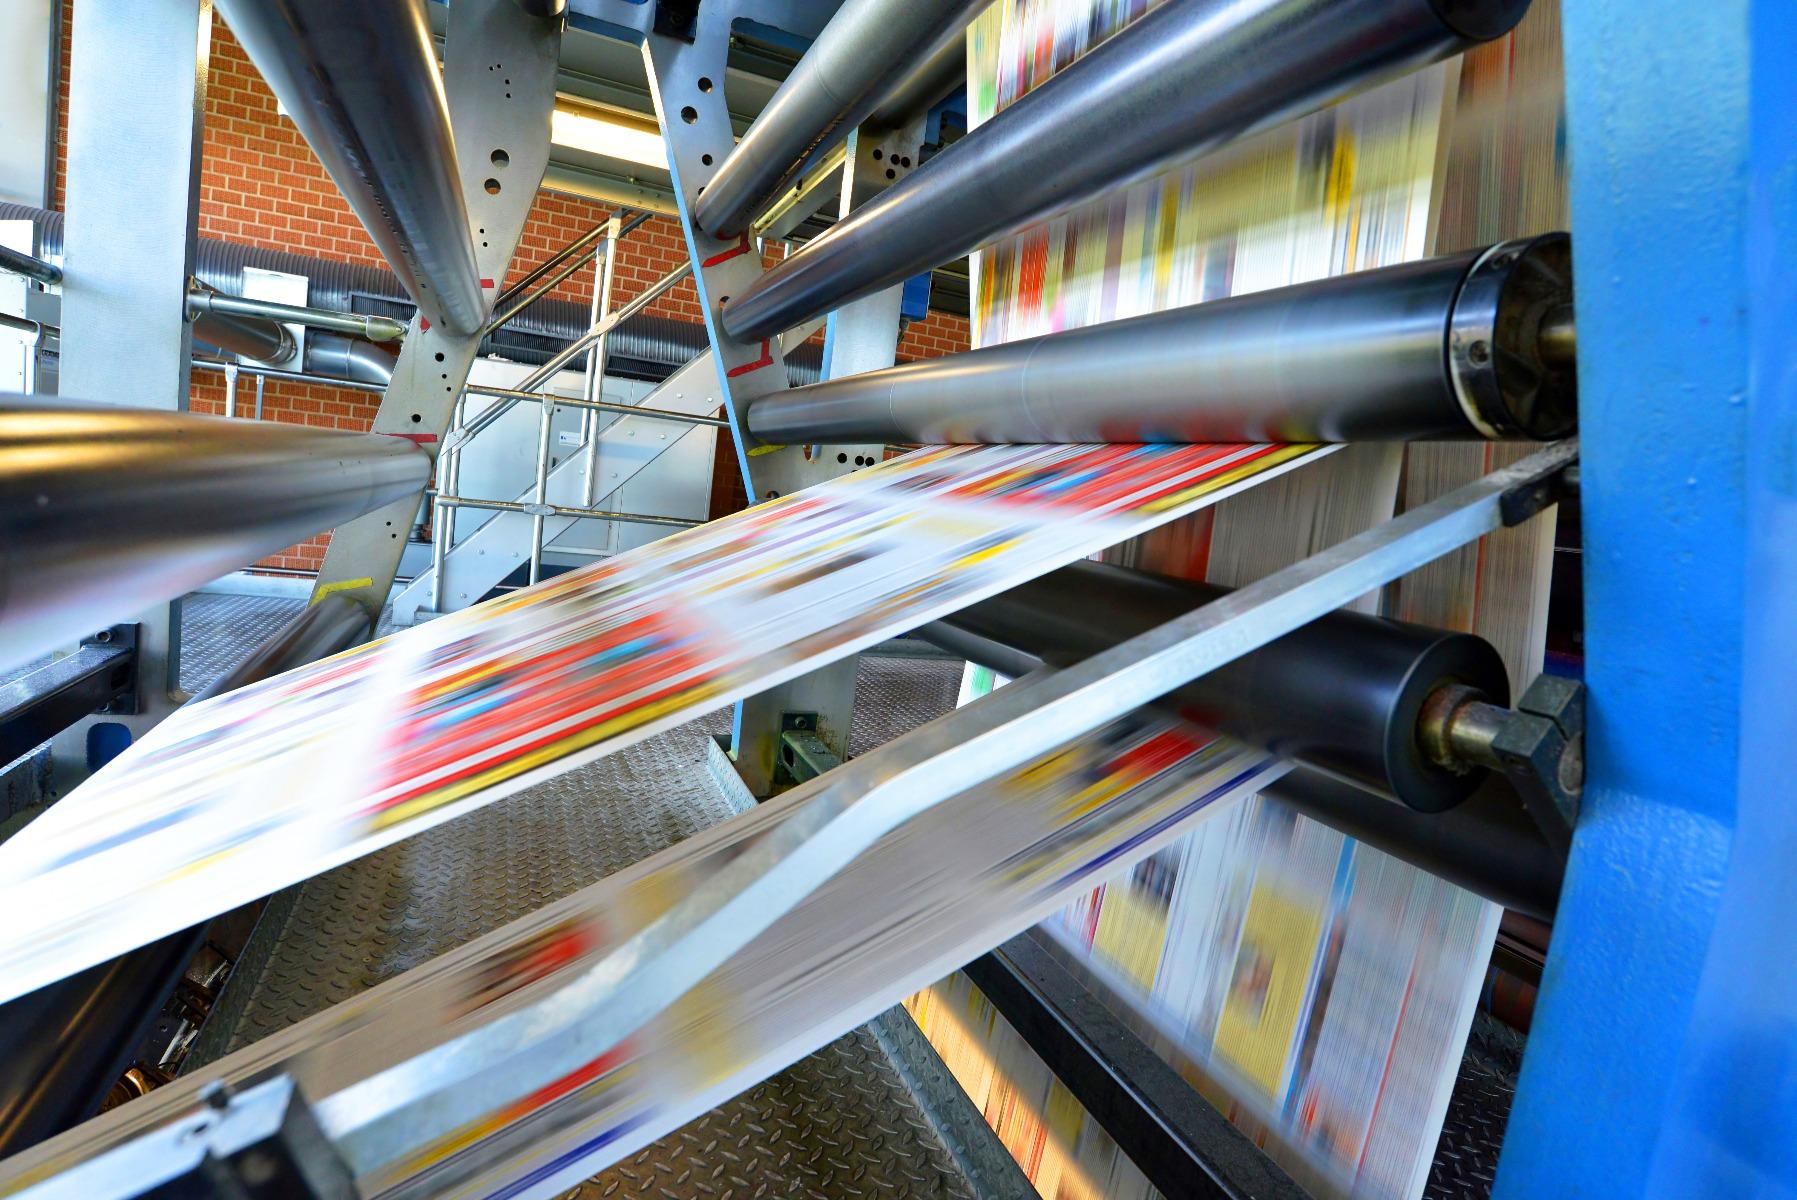 Printing Press Photo